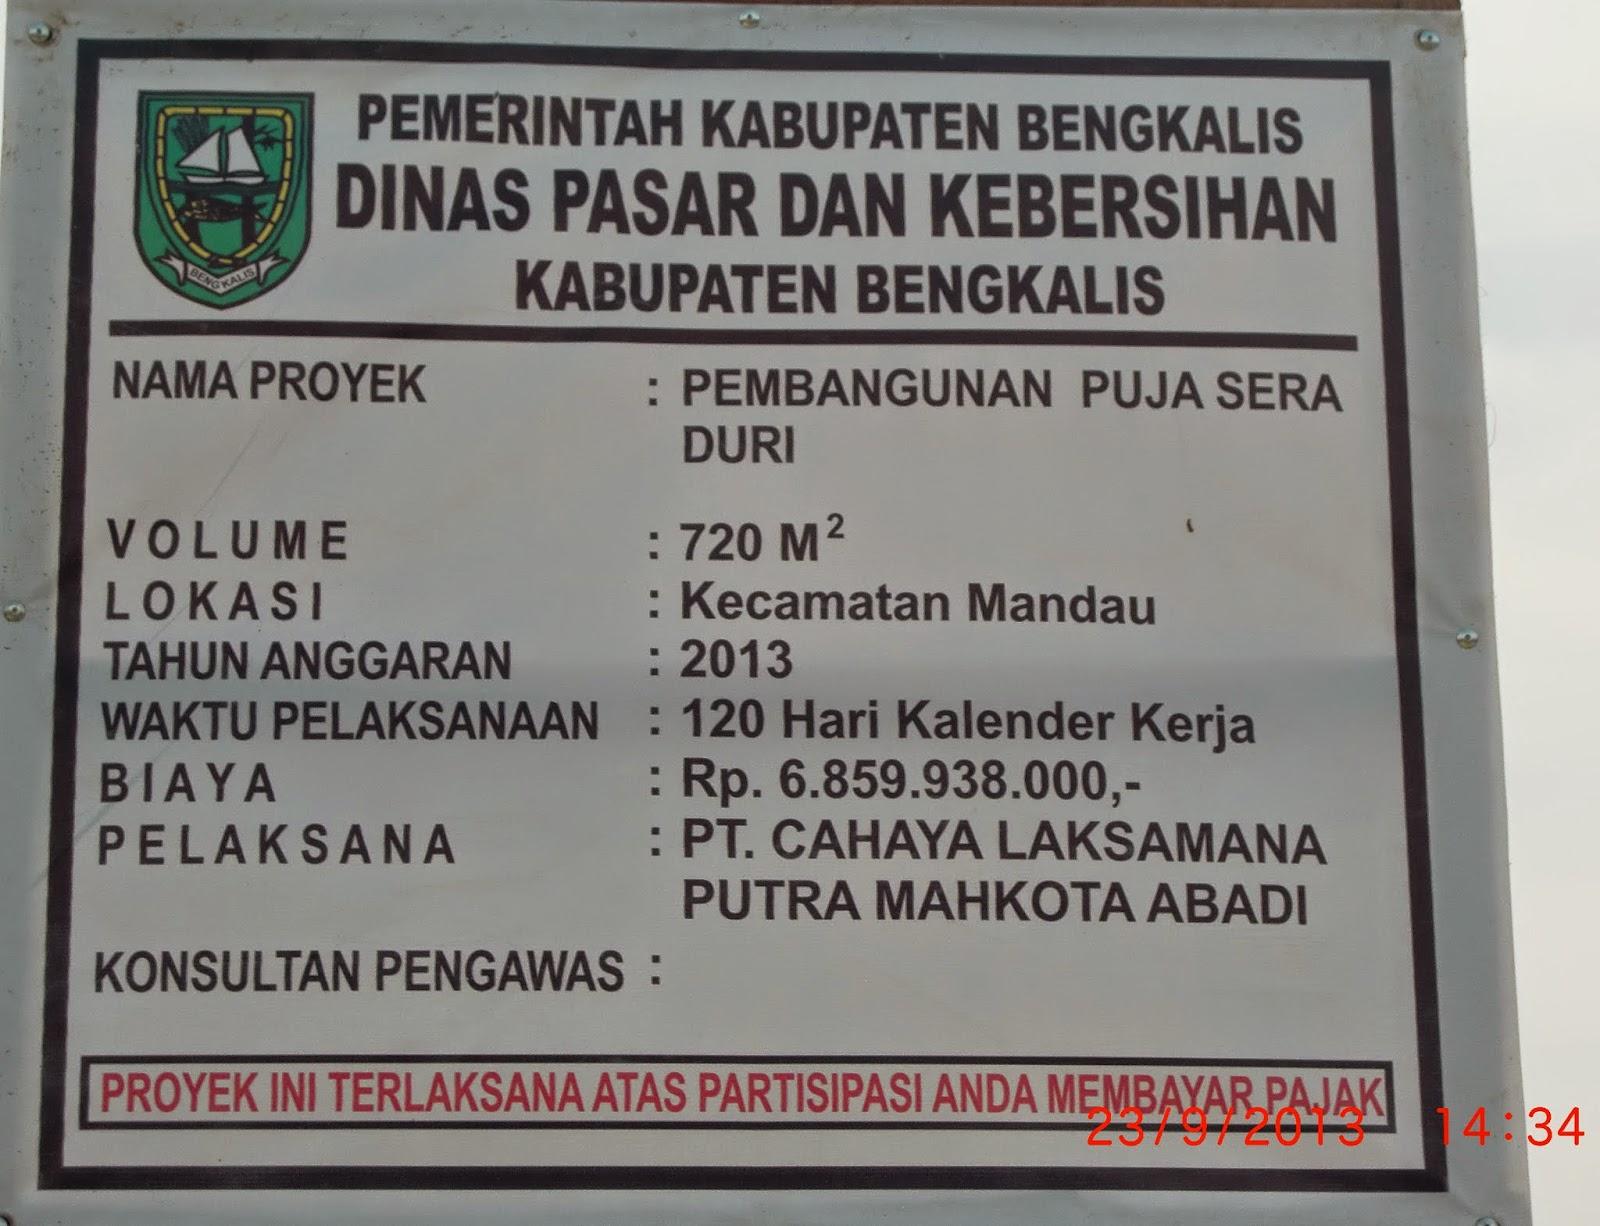 Menara Riau: BIAYA PEMBANGUNAN PUJASERA DI DURI TELAN